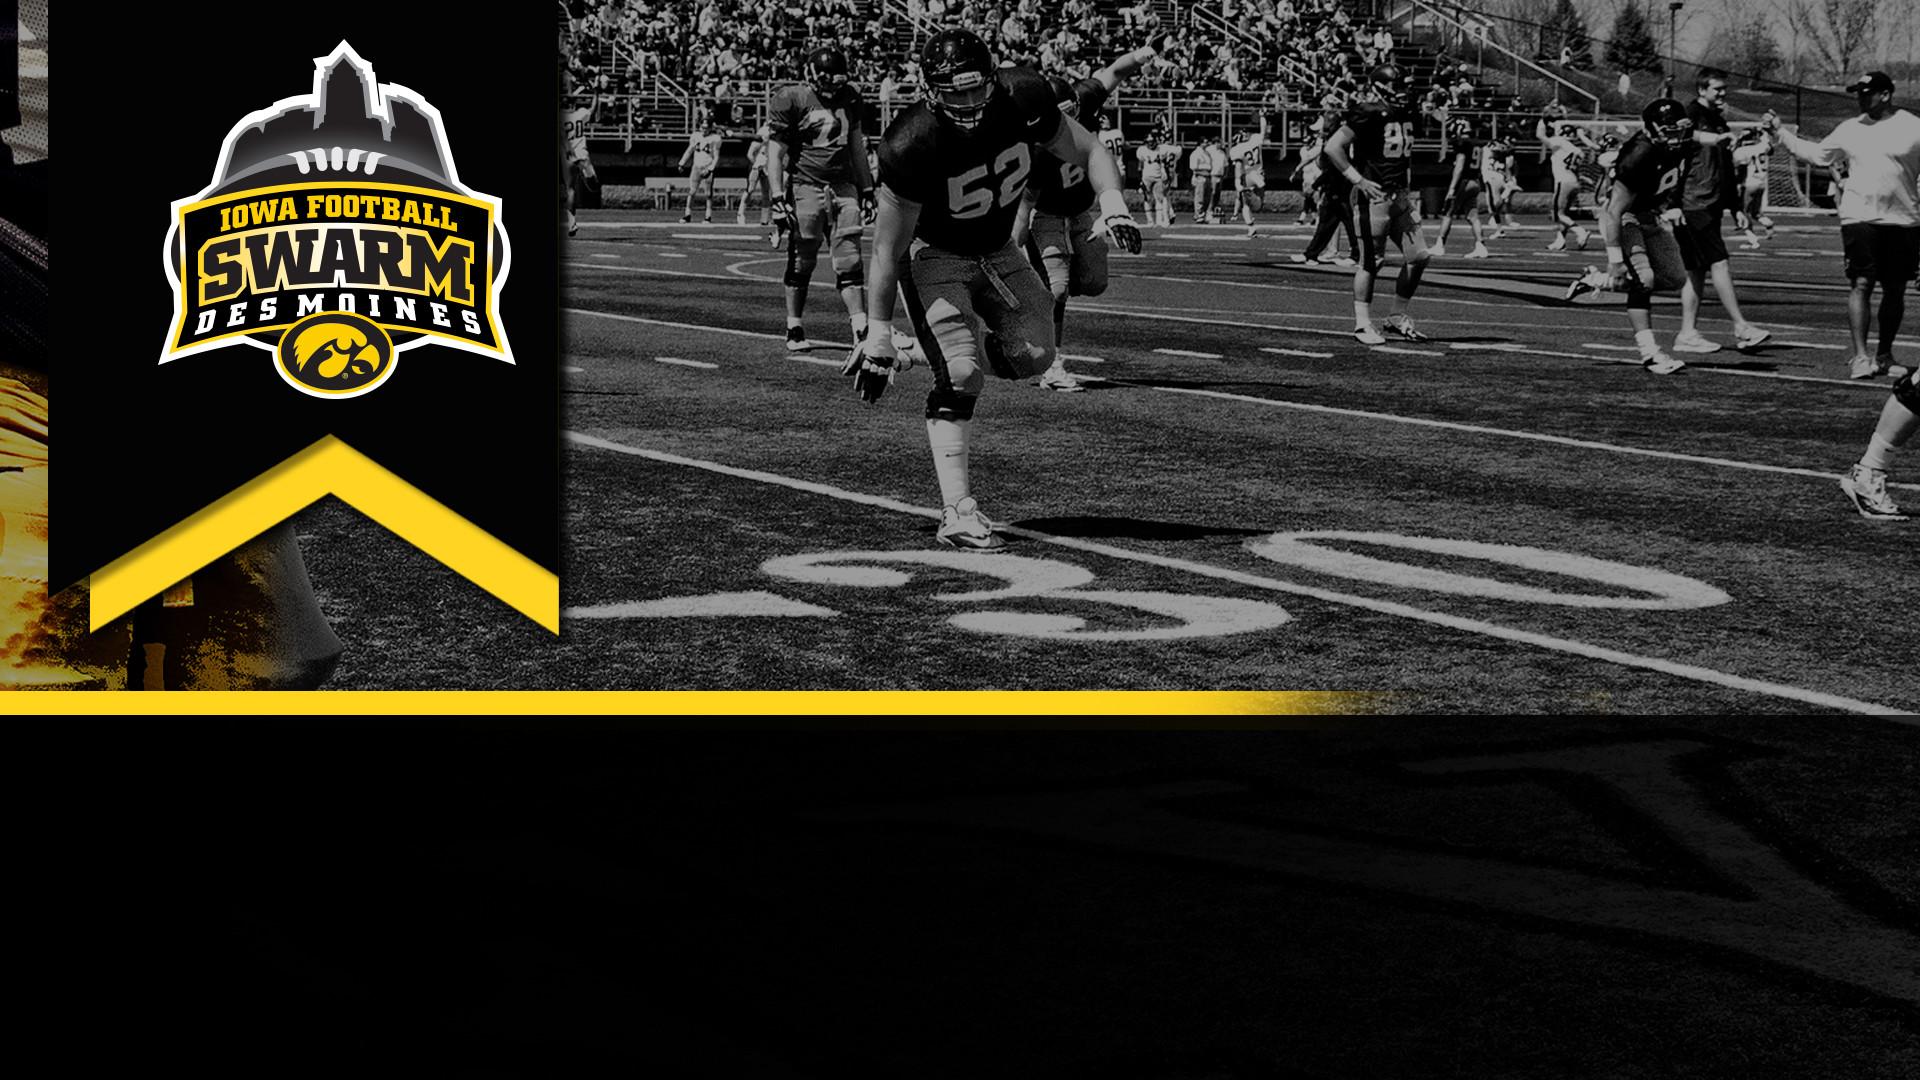 Iowa Football will Swarm Des Moines on April 7